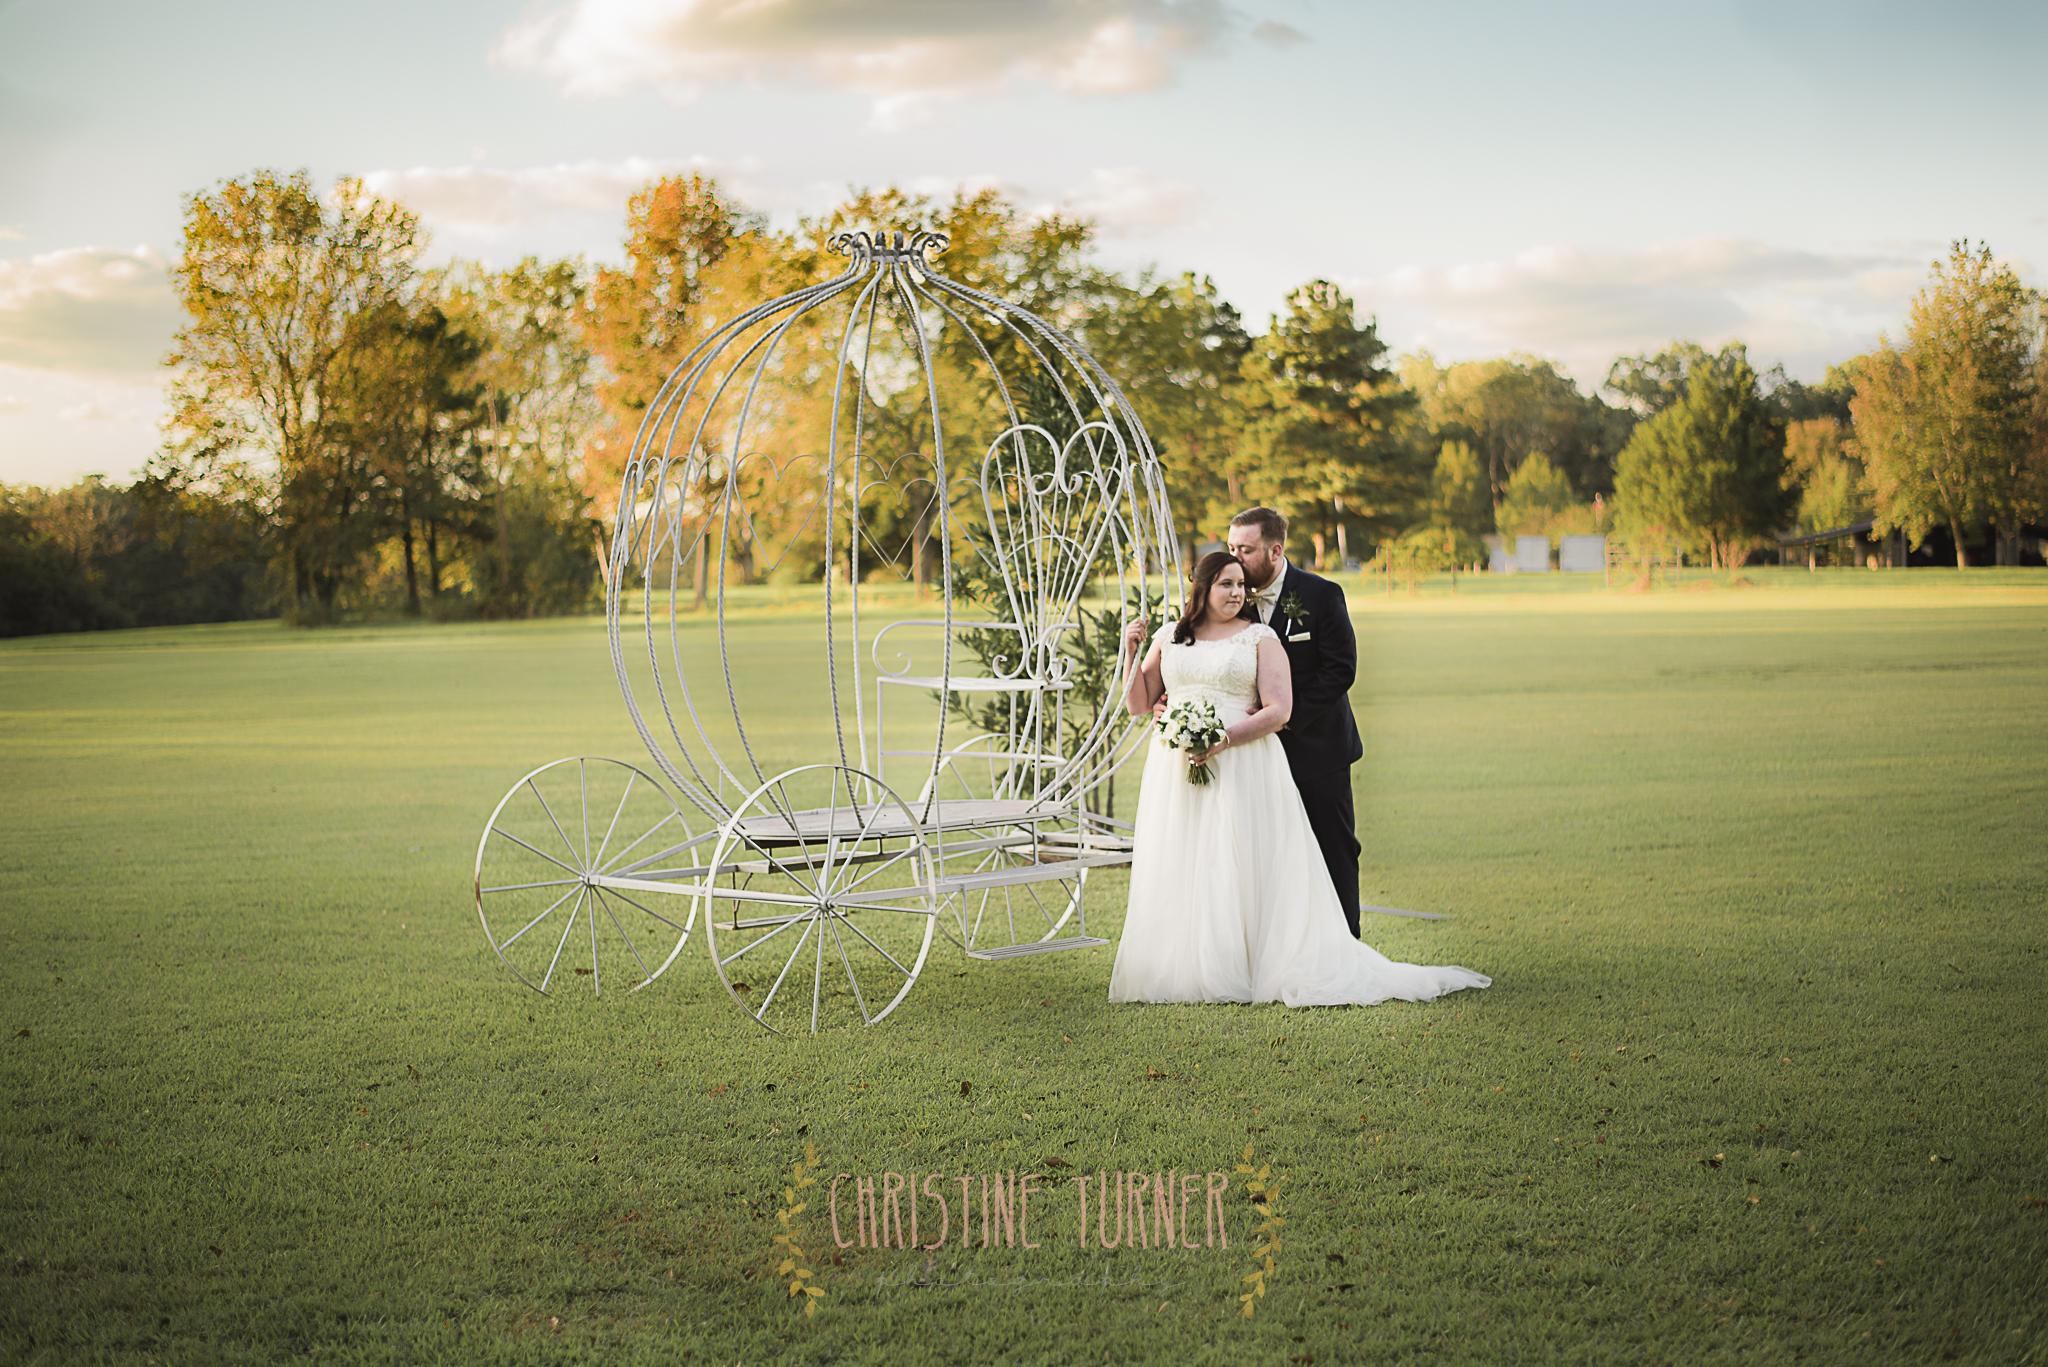 J&D Wedding (8 of 24)